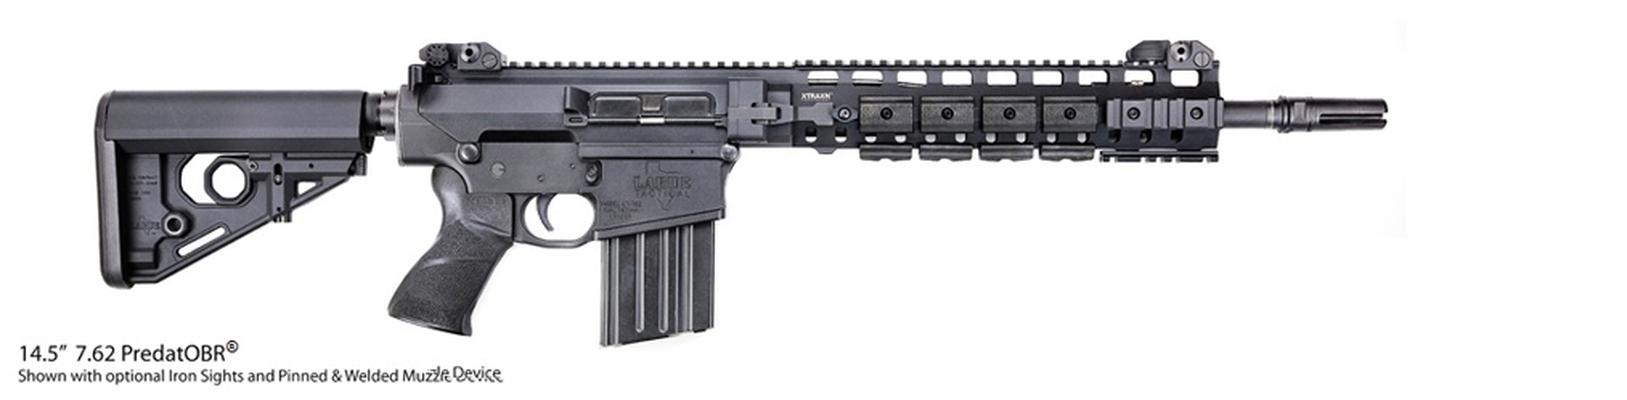 http://sp180.smugmug.com/Guns-Stuff/Rifles/LaRue-Tactical /i-JnQXNXr/0/L/IMG0819-L.jpg